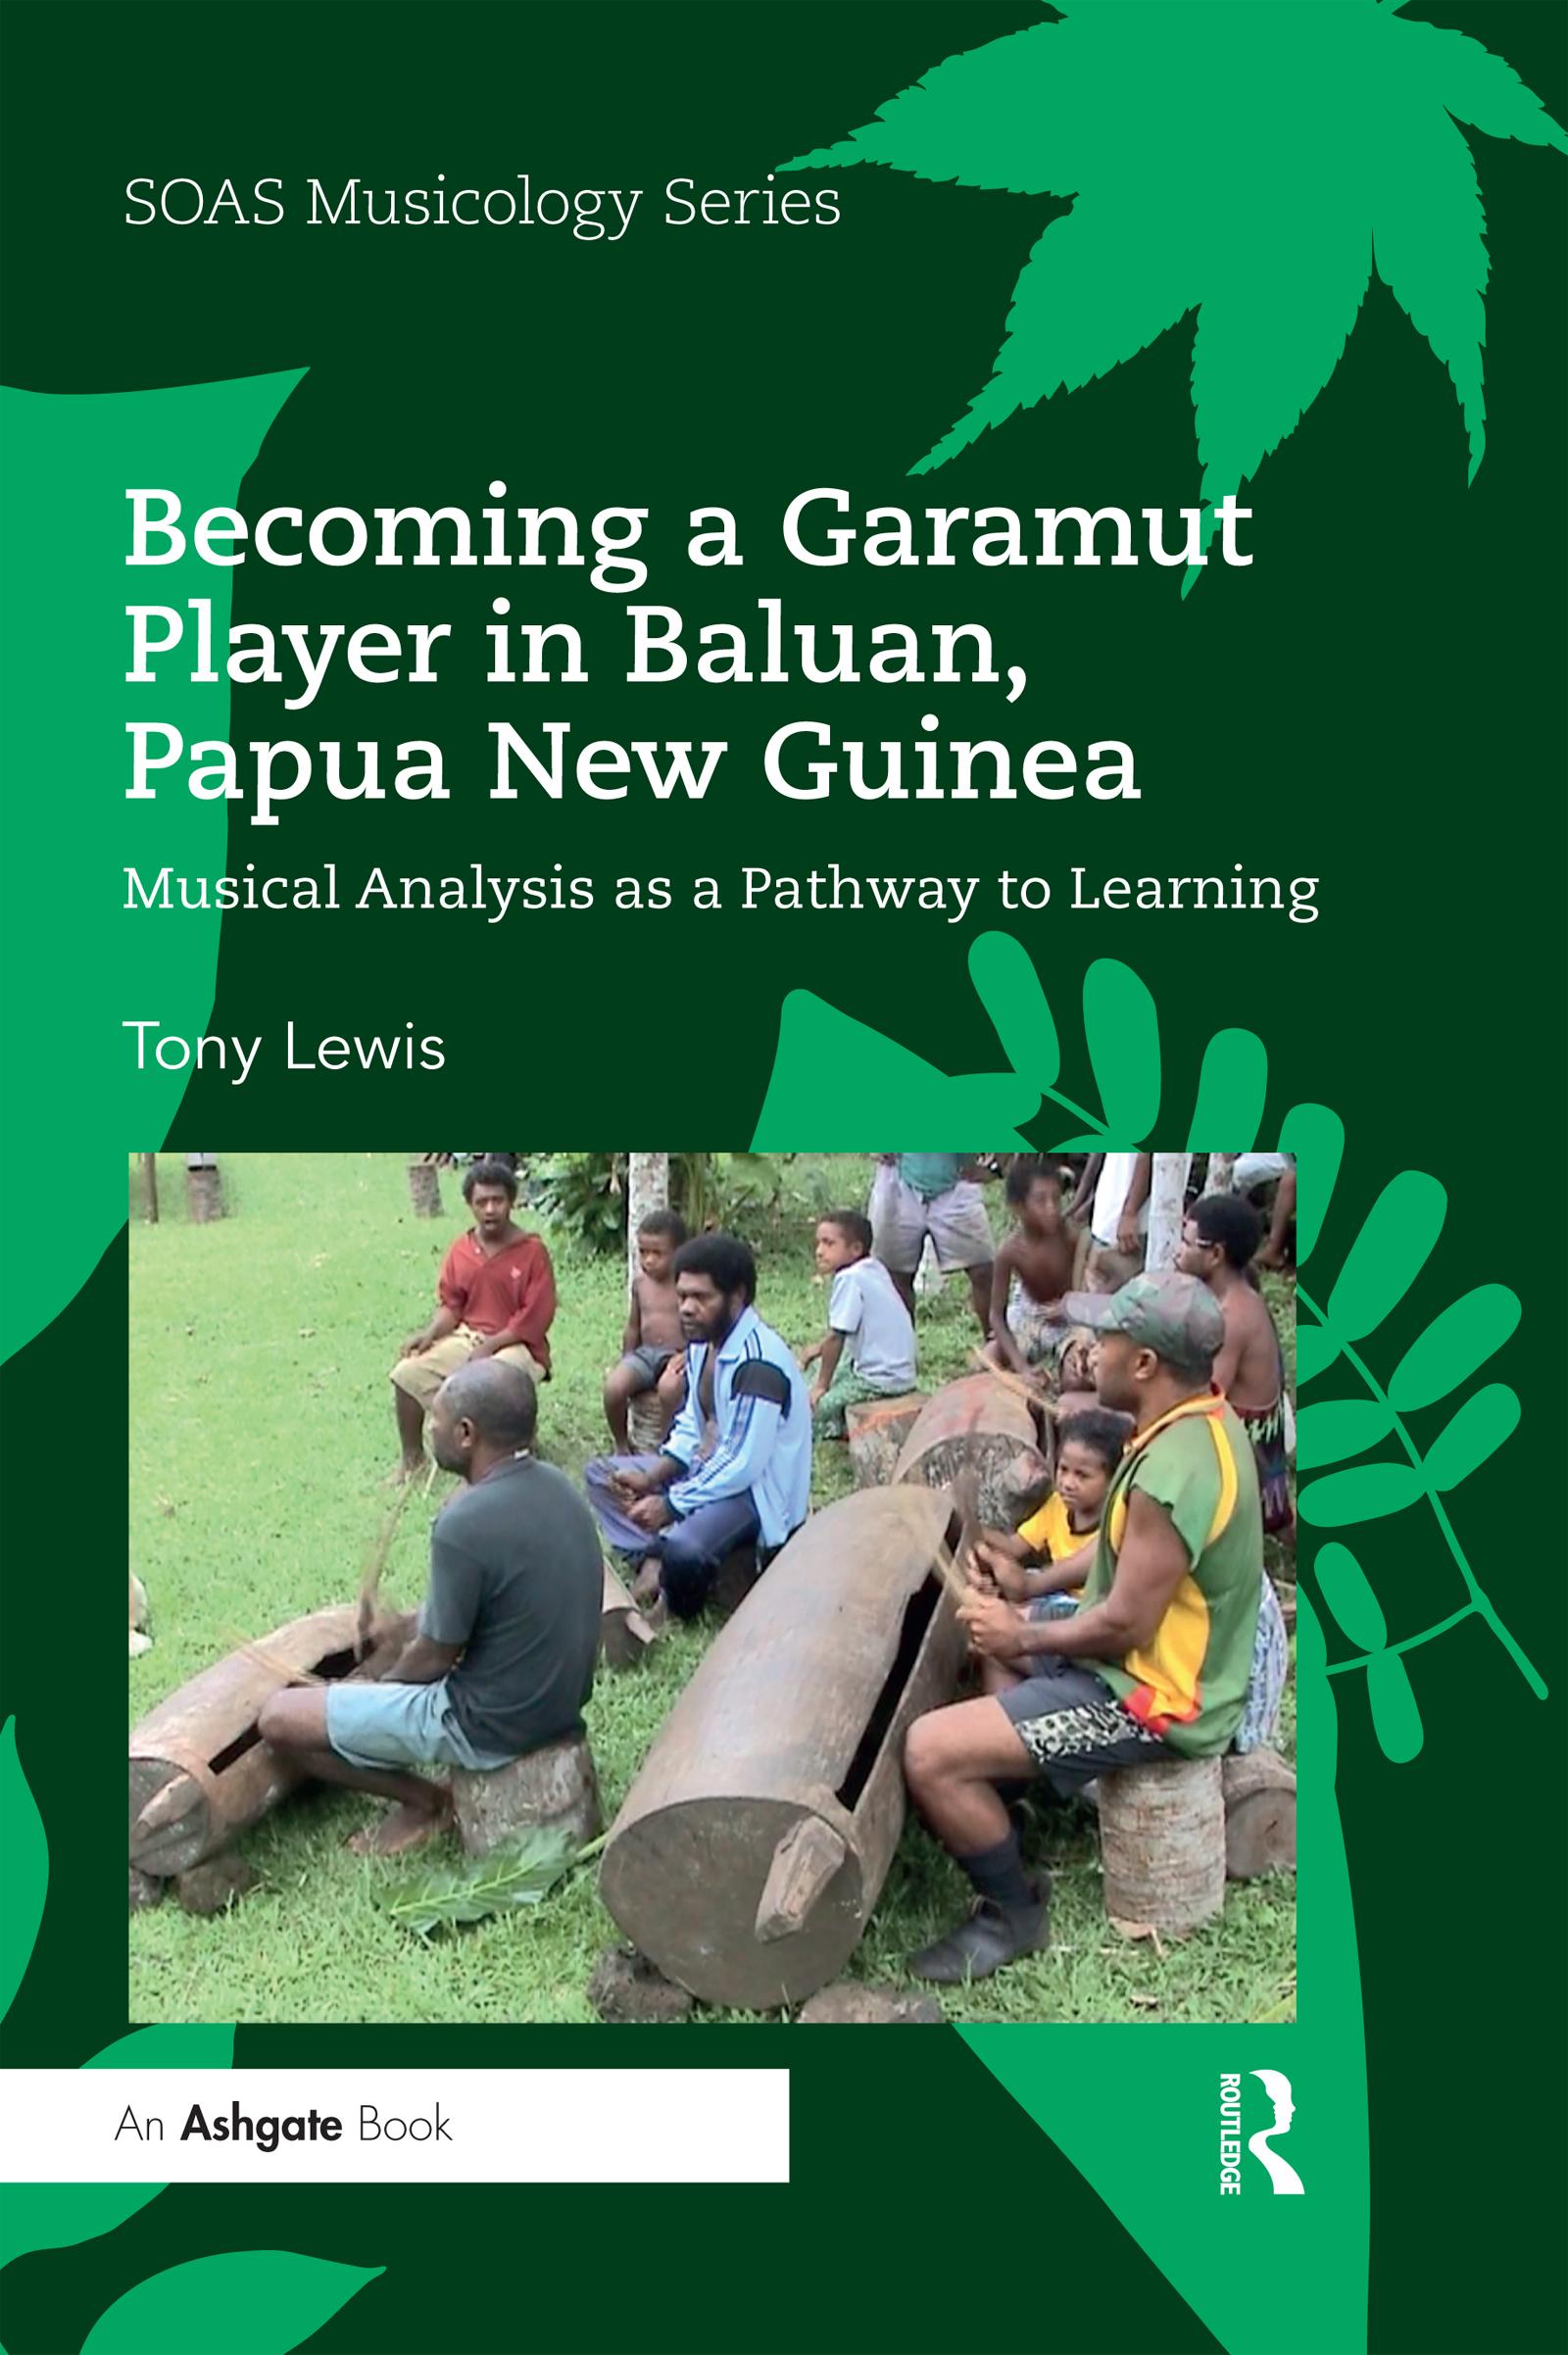 Becoming a Garamut Player in Baluan, Papua New Guinea